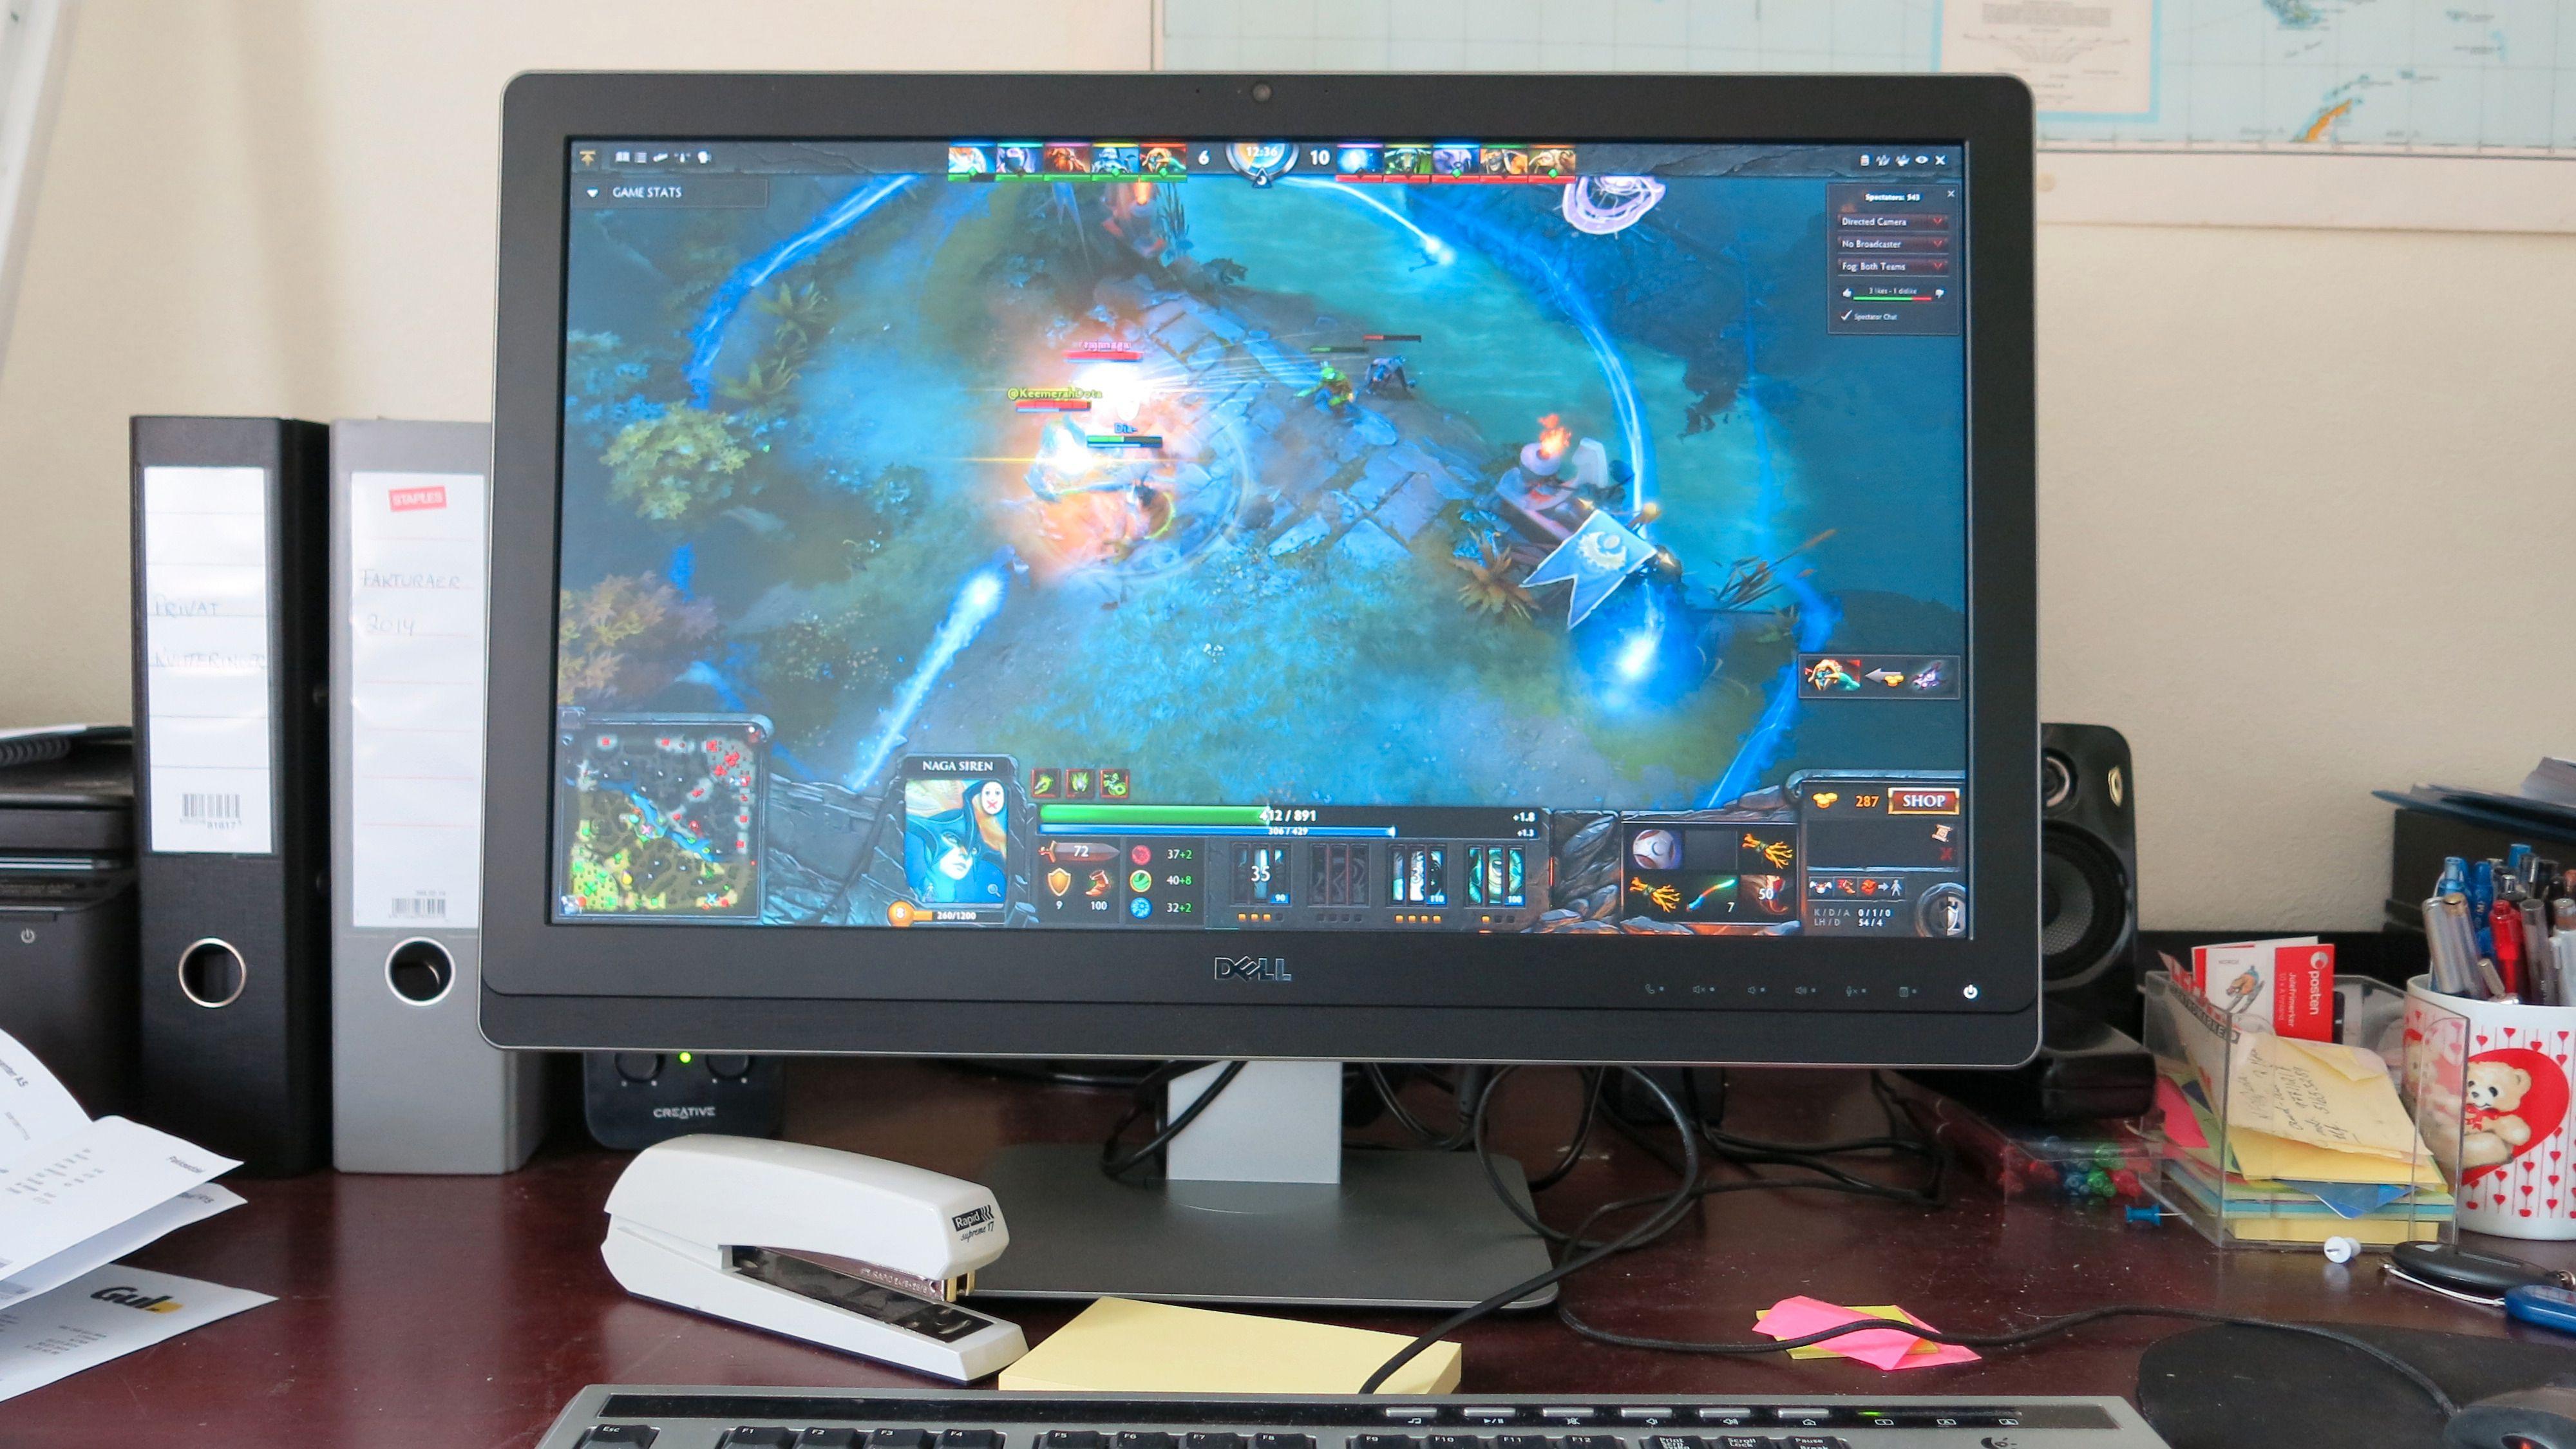 Dell UltraSharp UZ2315H